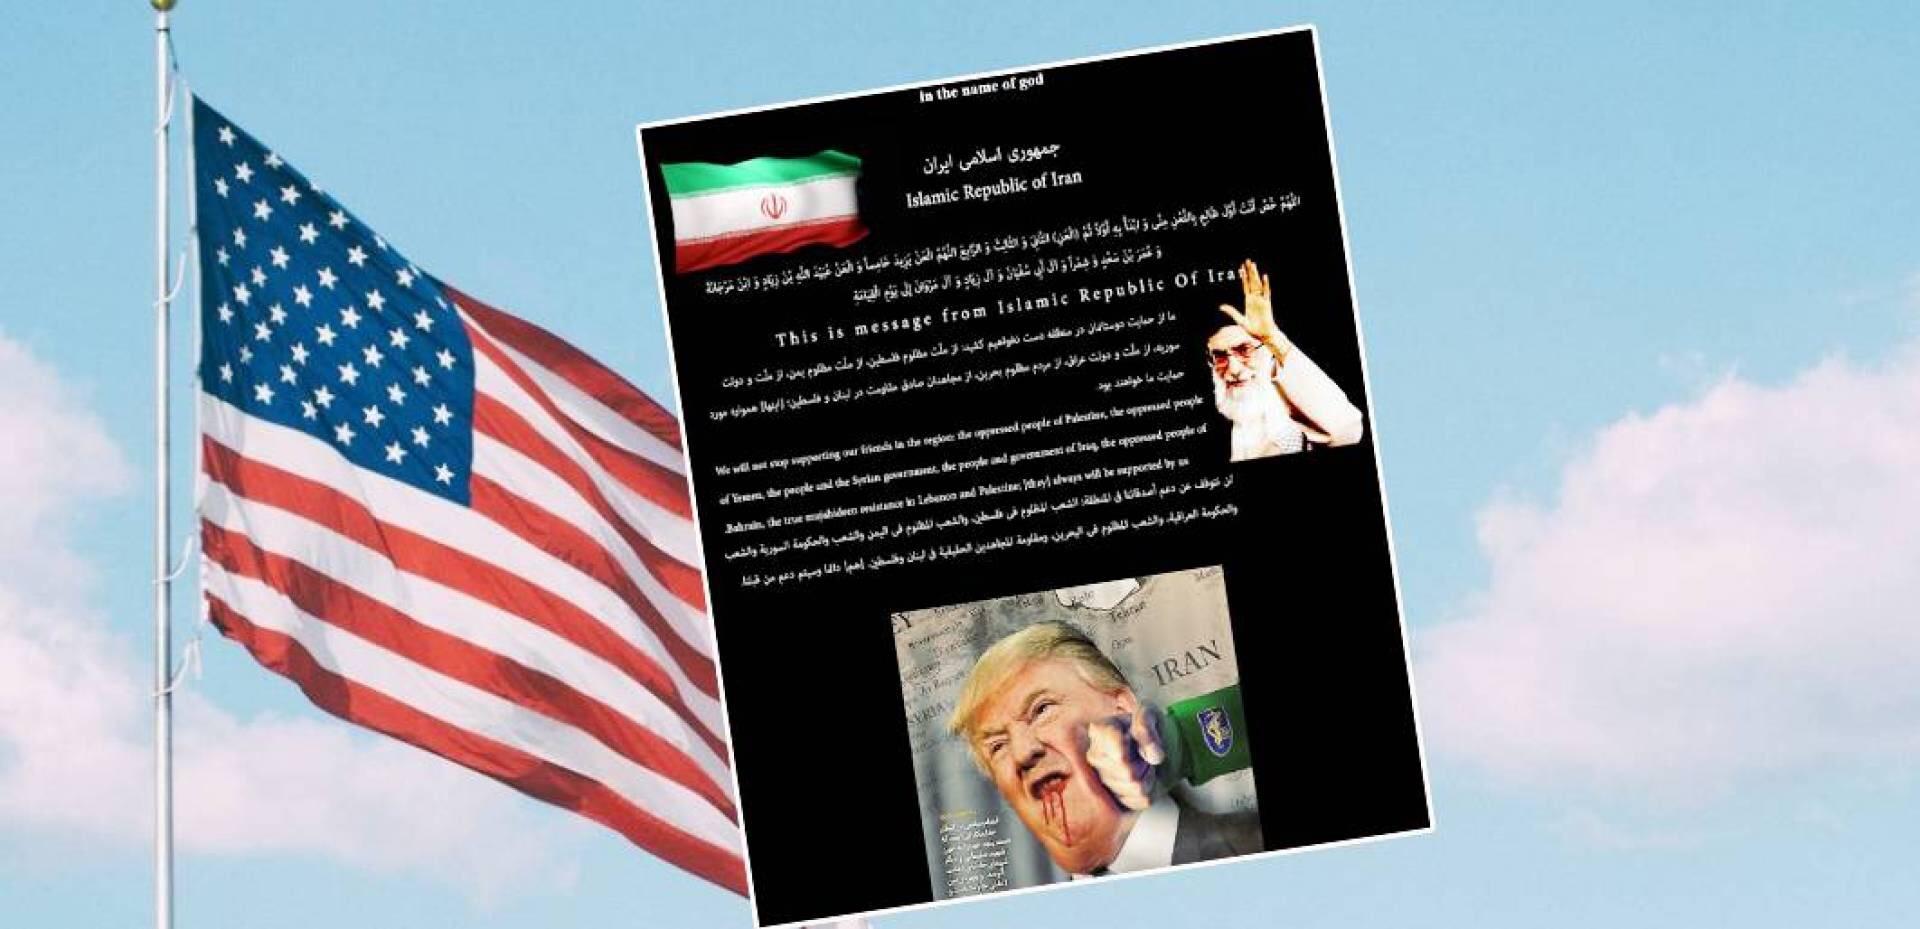 img 7288 - «قراصنة إيرانيون».. يخترقون وكالة حكومية أميركية